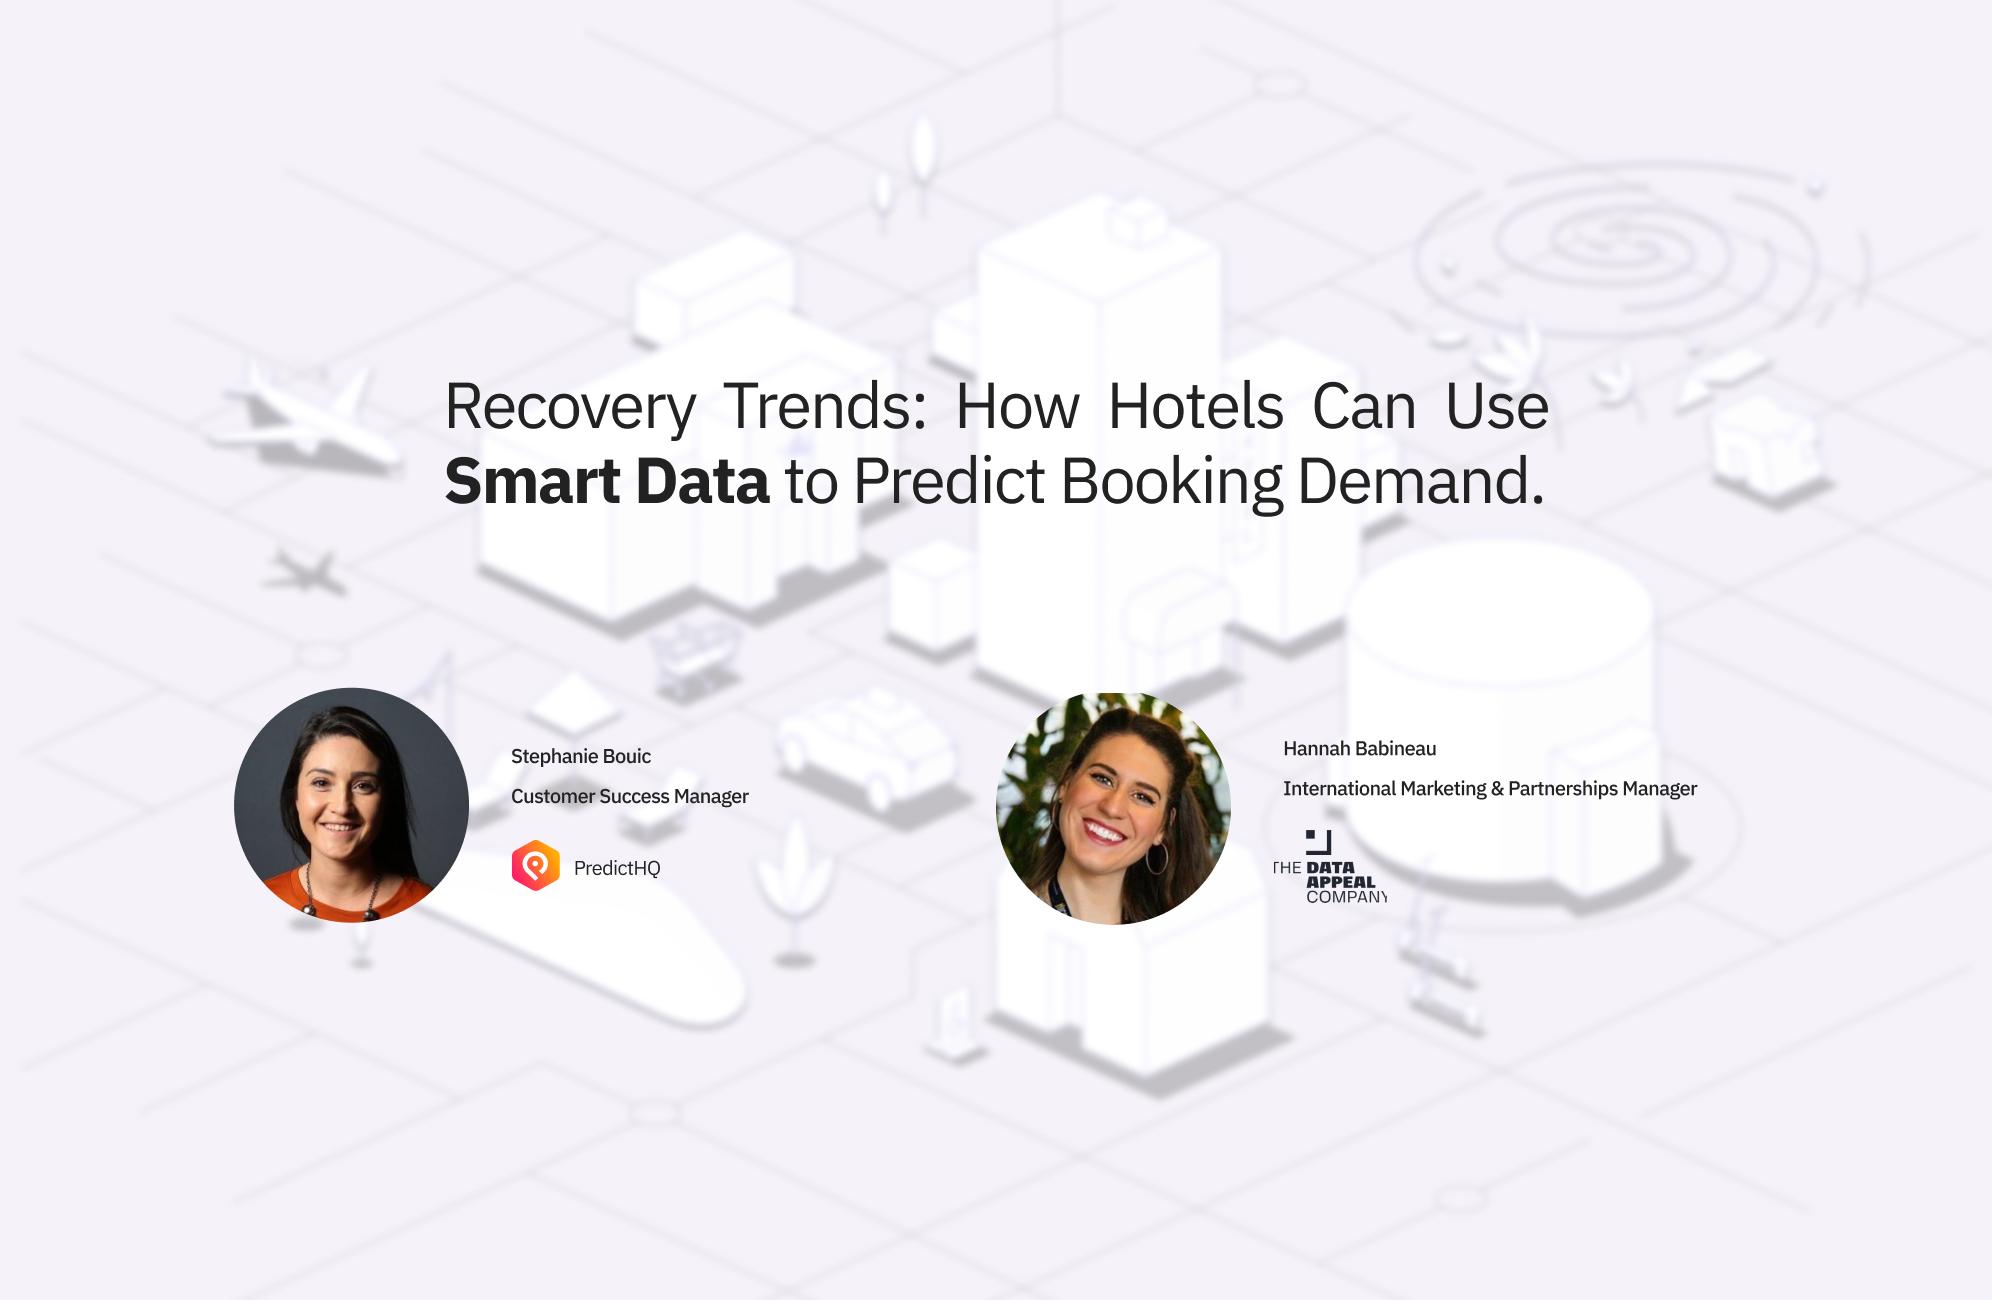 Tourism & Hospitality Recovery Trends - ripresa del turismo e dell'hospitality